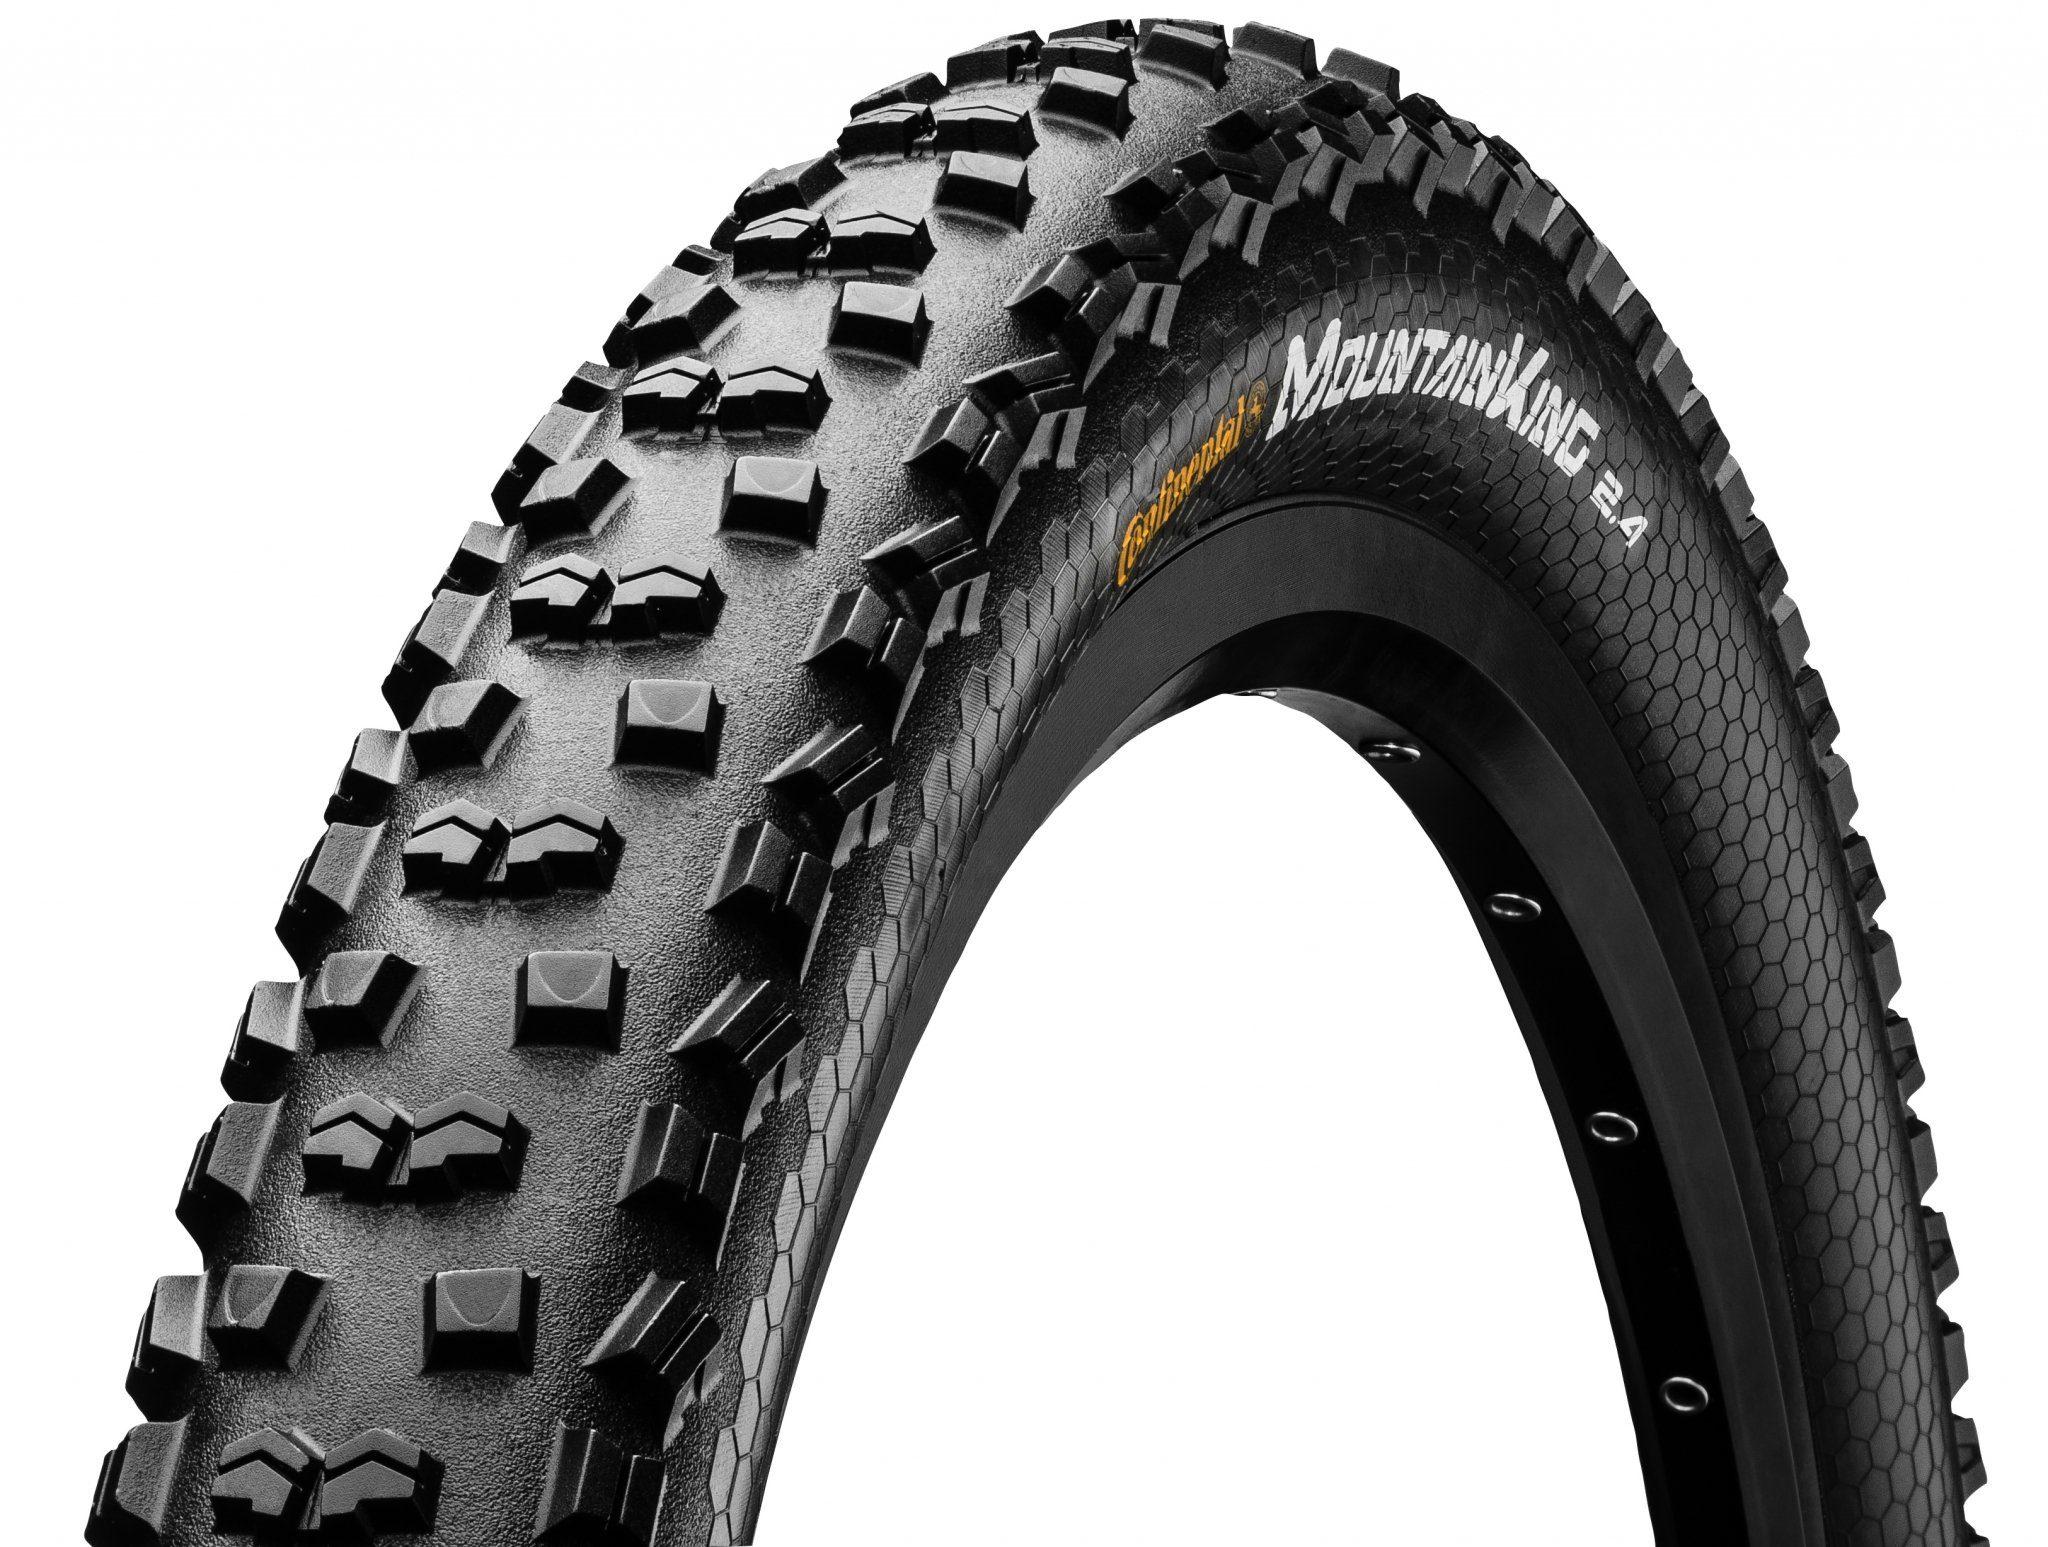 Continental Fahrradreifen »Mountain King II 2.4 Sport 29 Zoll Draht Skin«